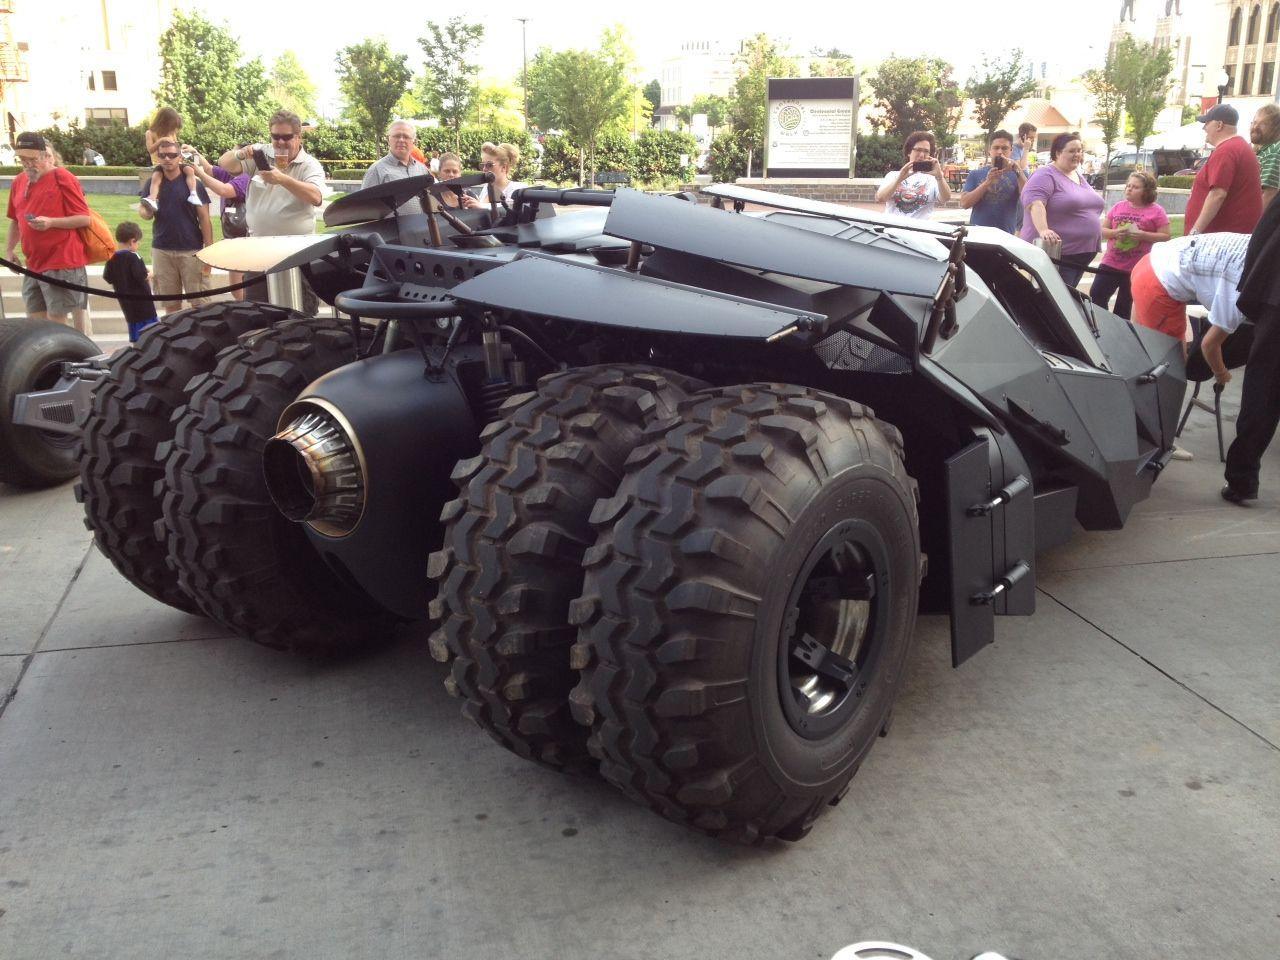 THE DARK KNIGHT RISES Tumbler and Bat-Pod Images | Collider